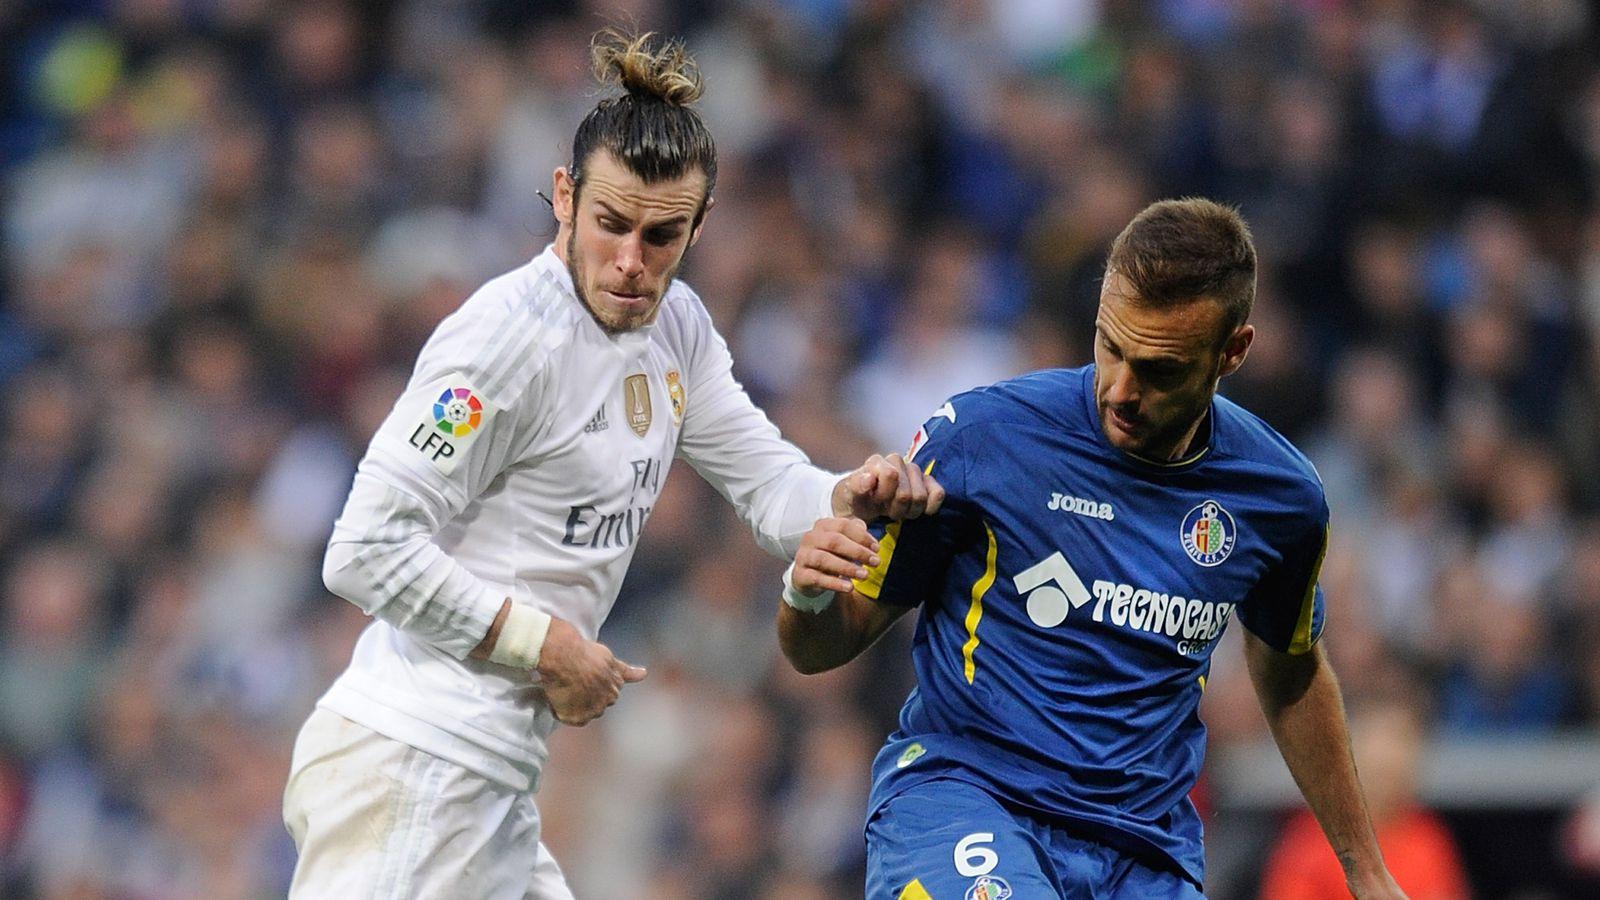 Real Madrid Vs Getafe Live Stream Watch La Liga Matches